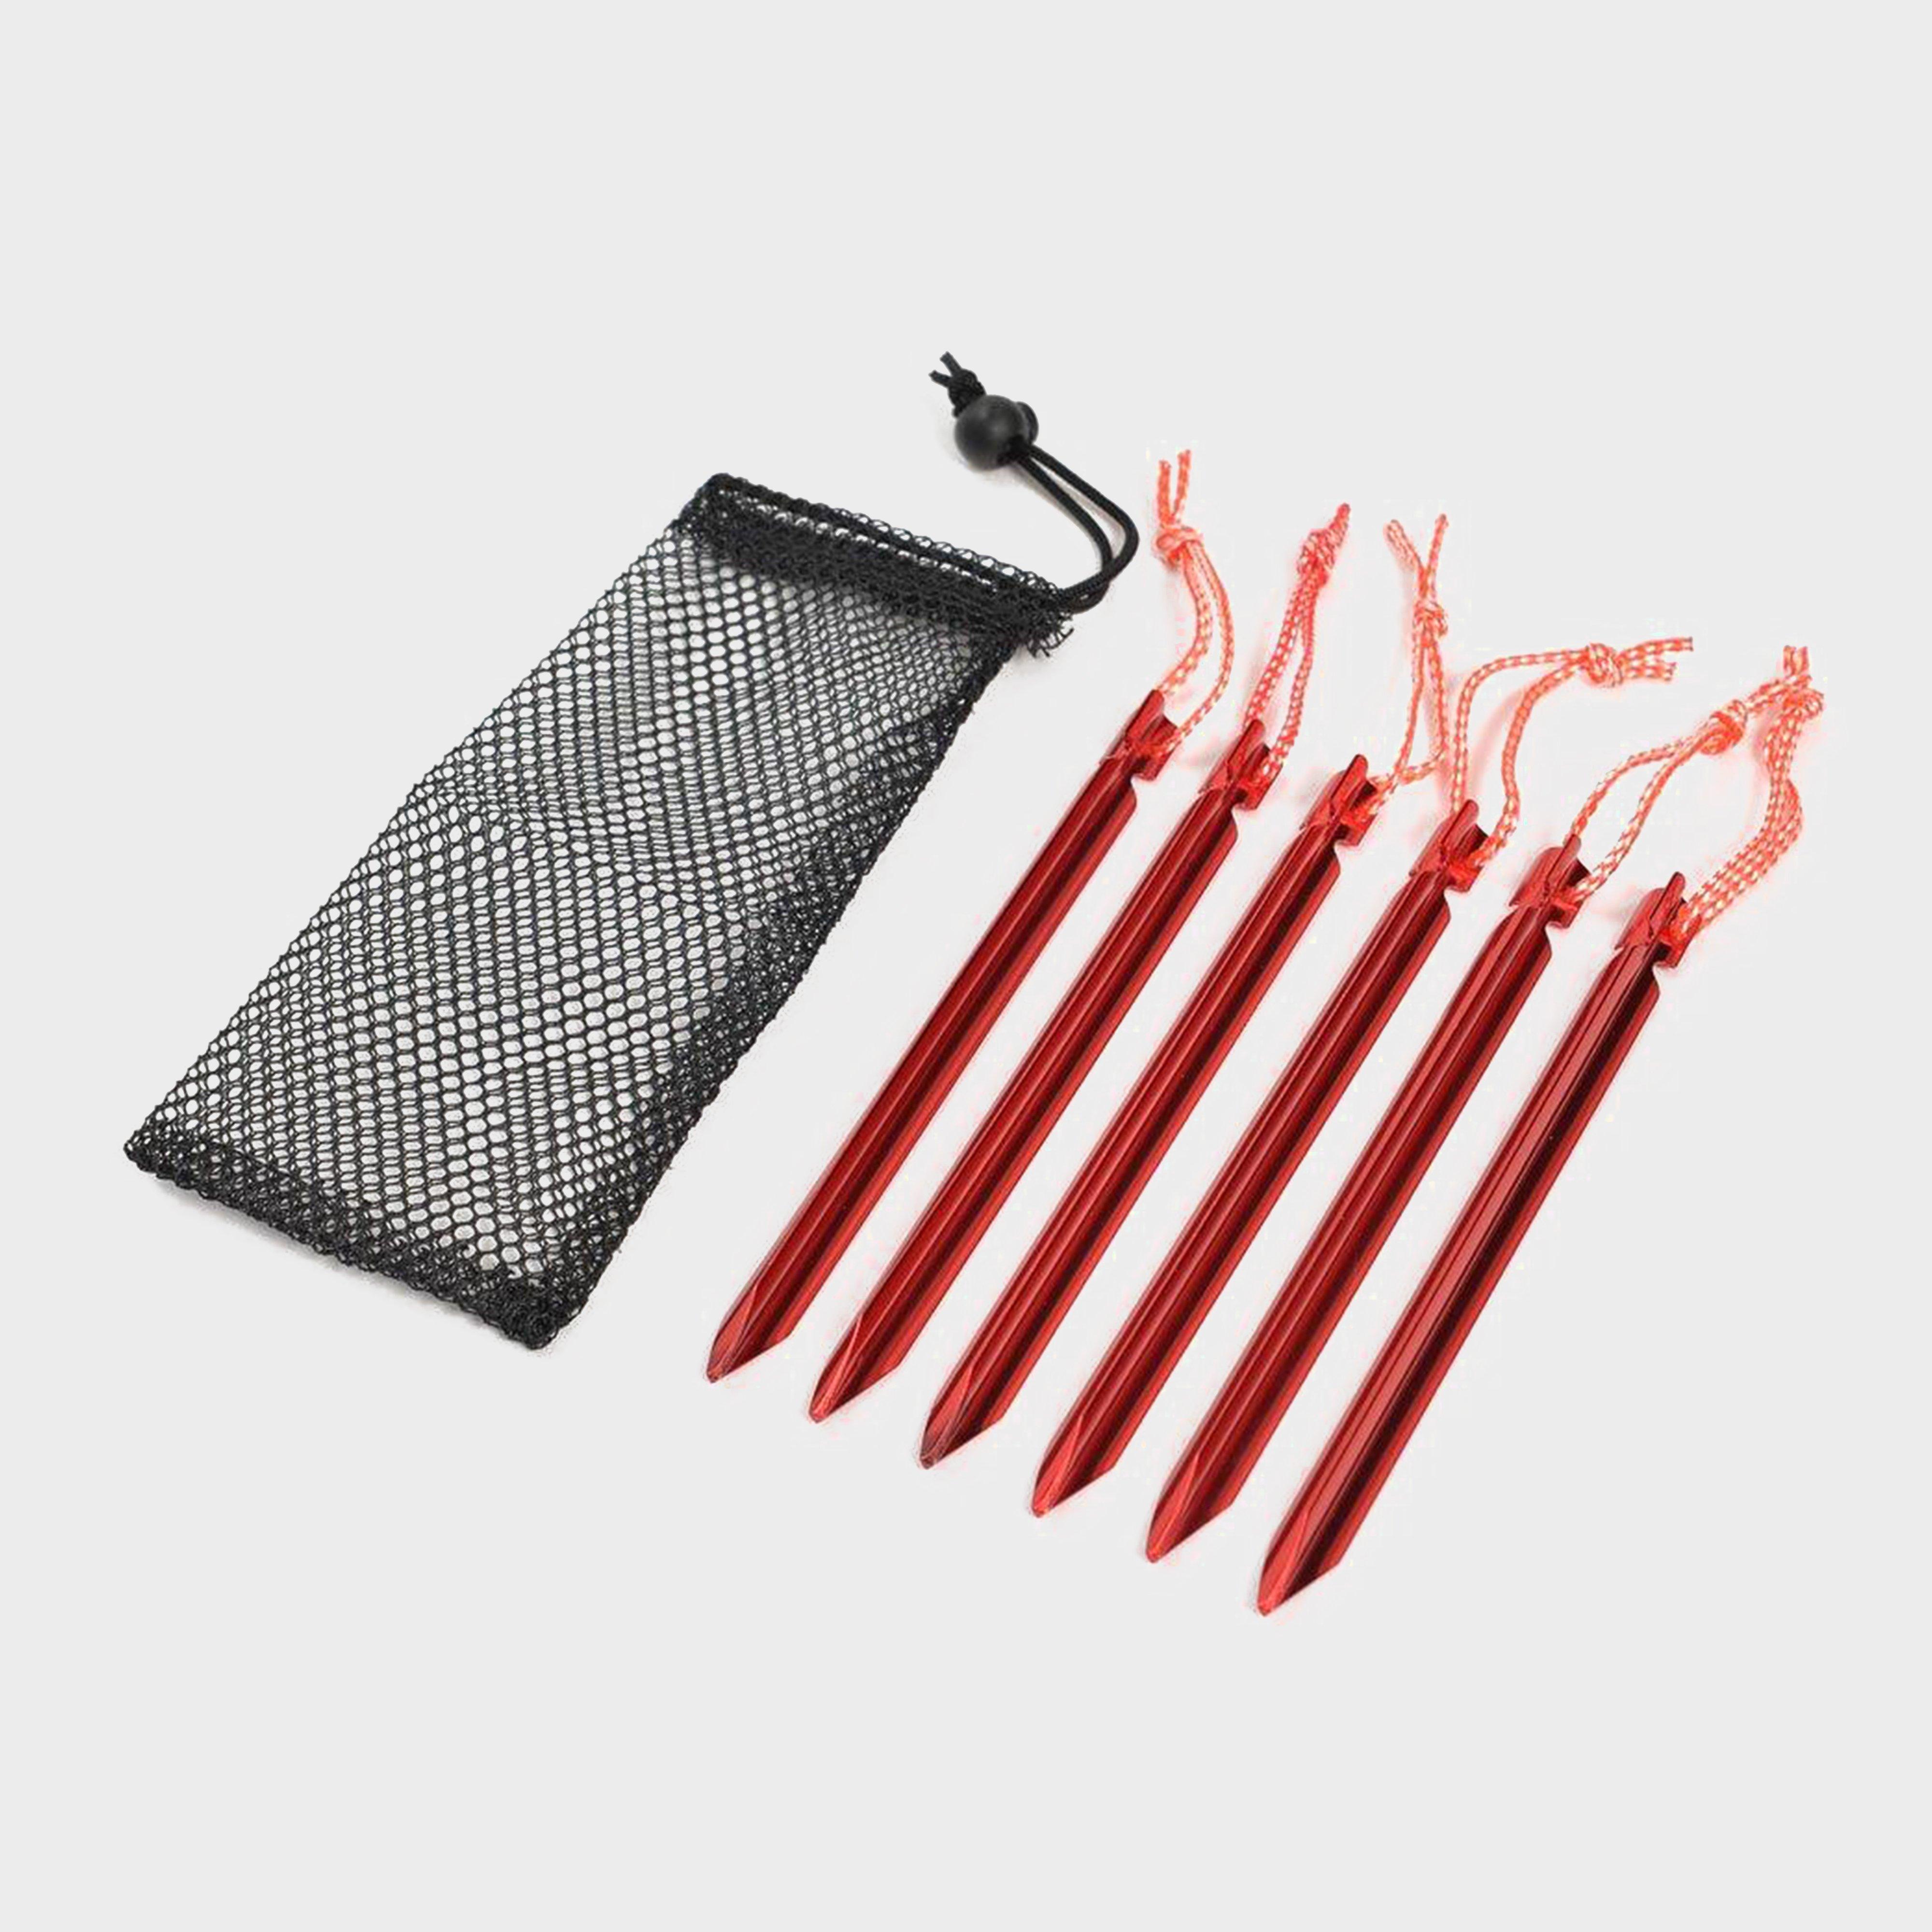 Oex Oex Arrow Lightweight Aluminium Pegs (6 Pack) - Red, Red